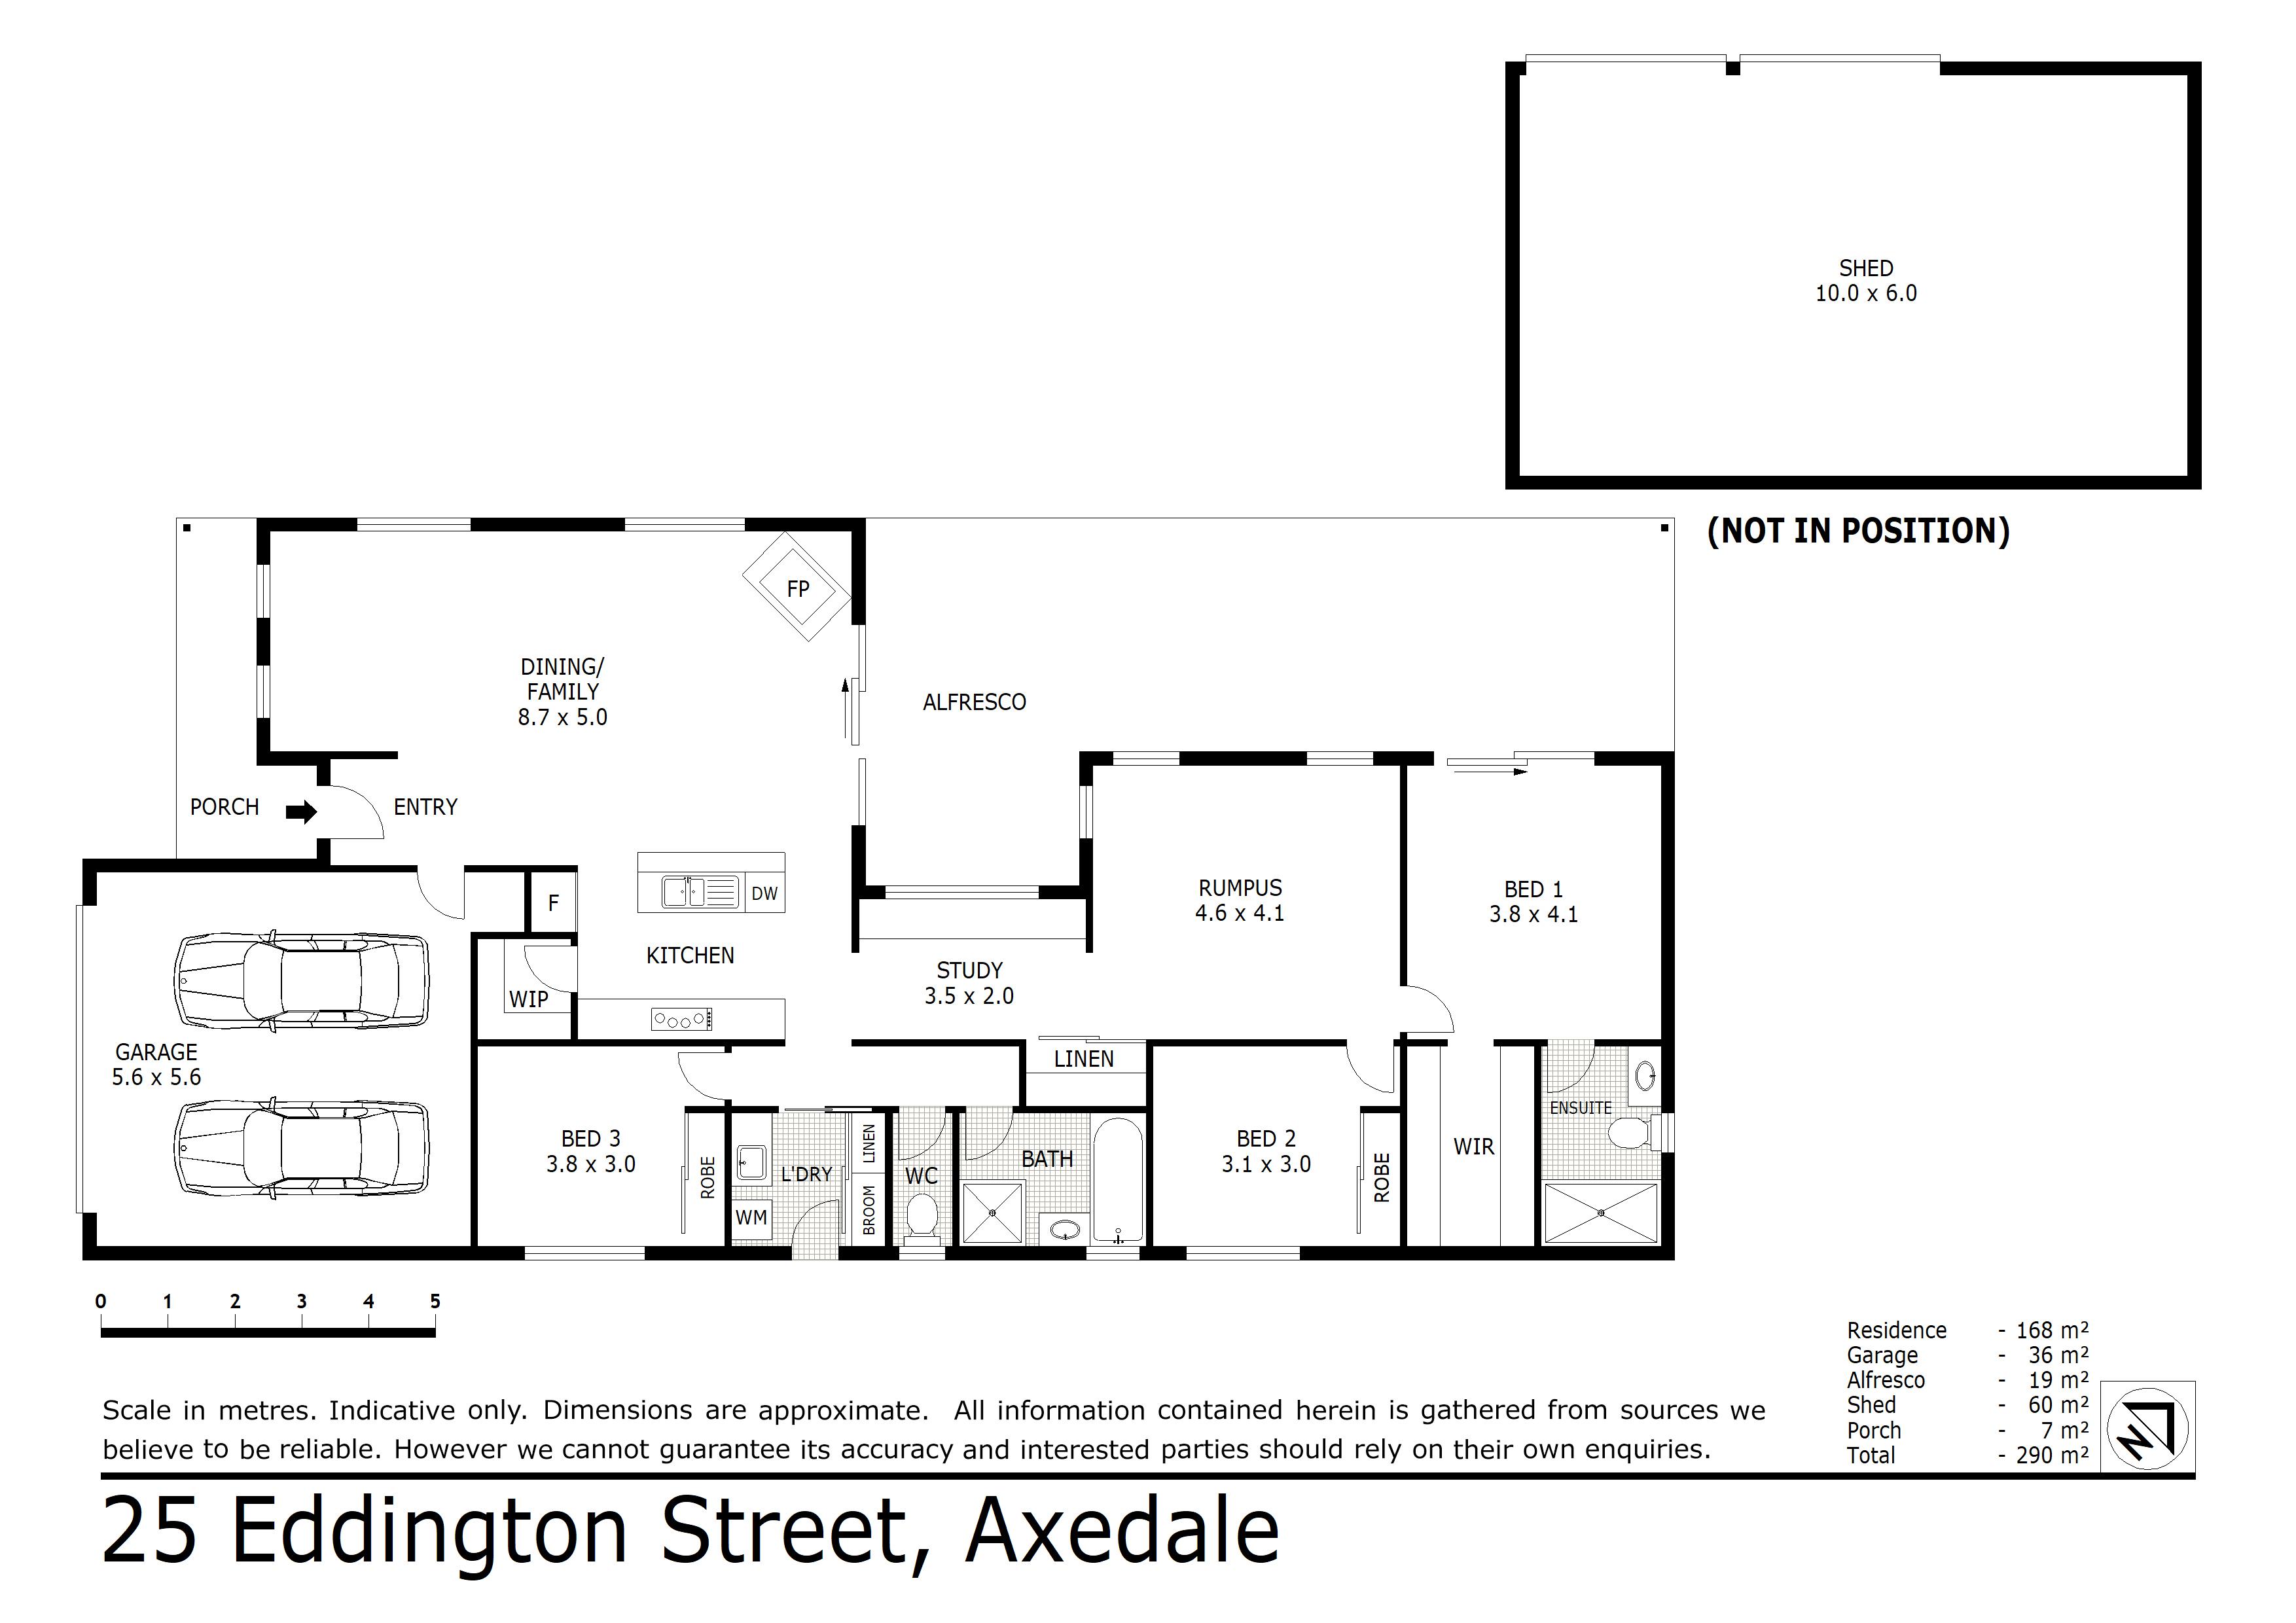 25 Eddington Street, Axedale, VIC 3551